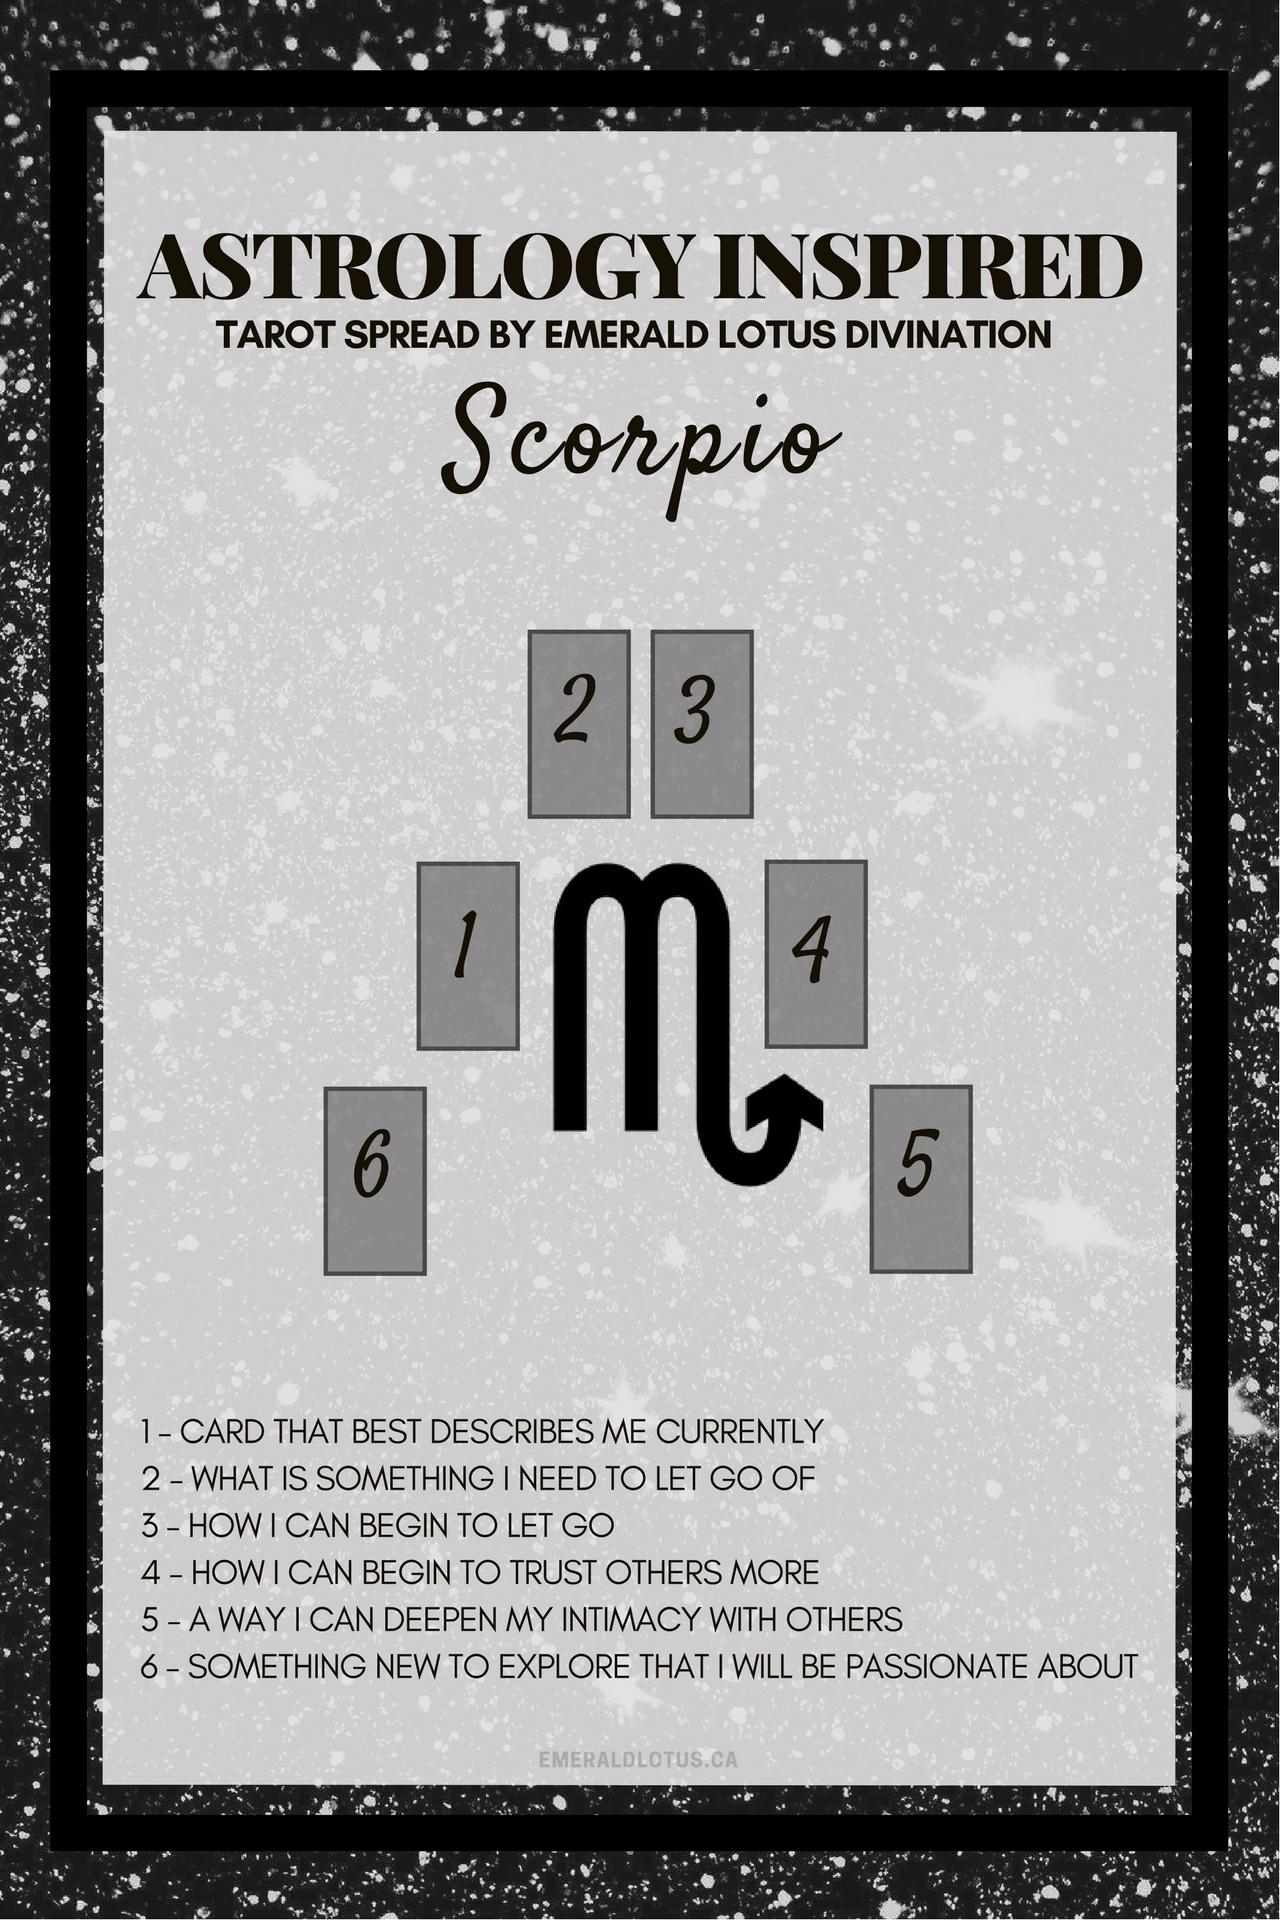 scorpio-tarot-spread-astrology-1.png